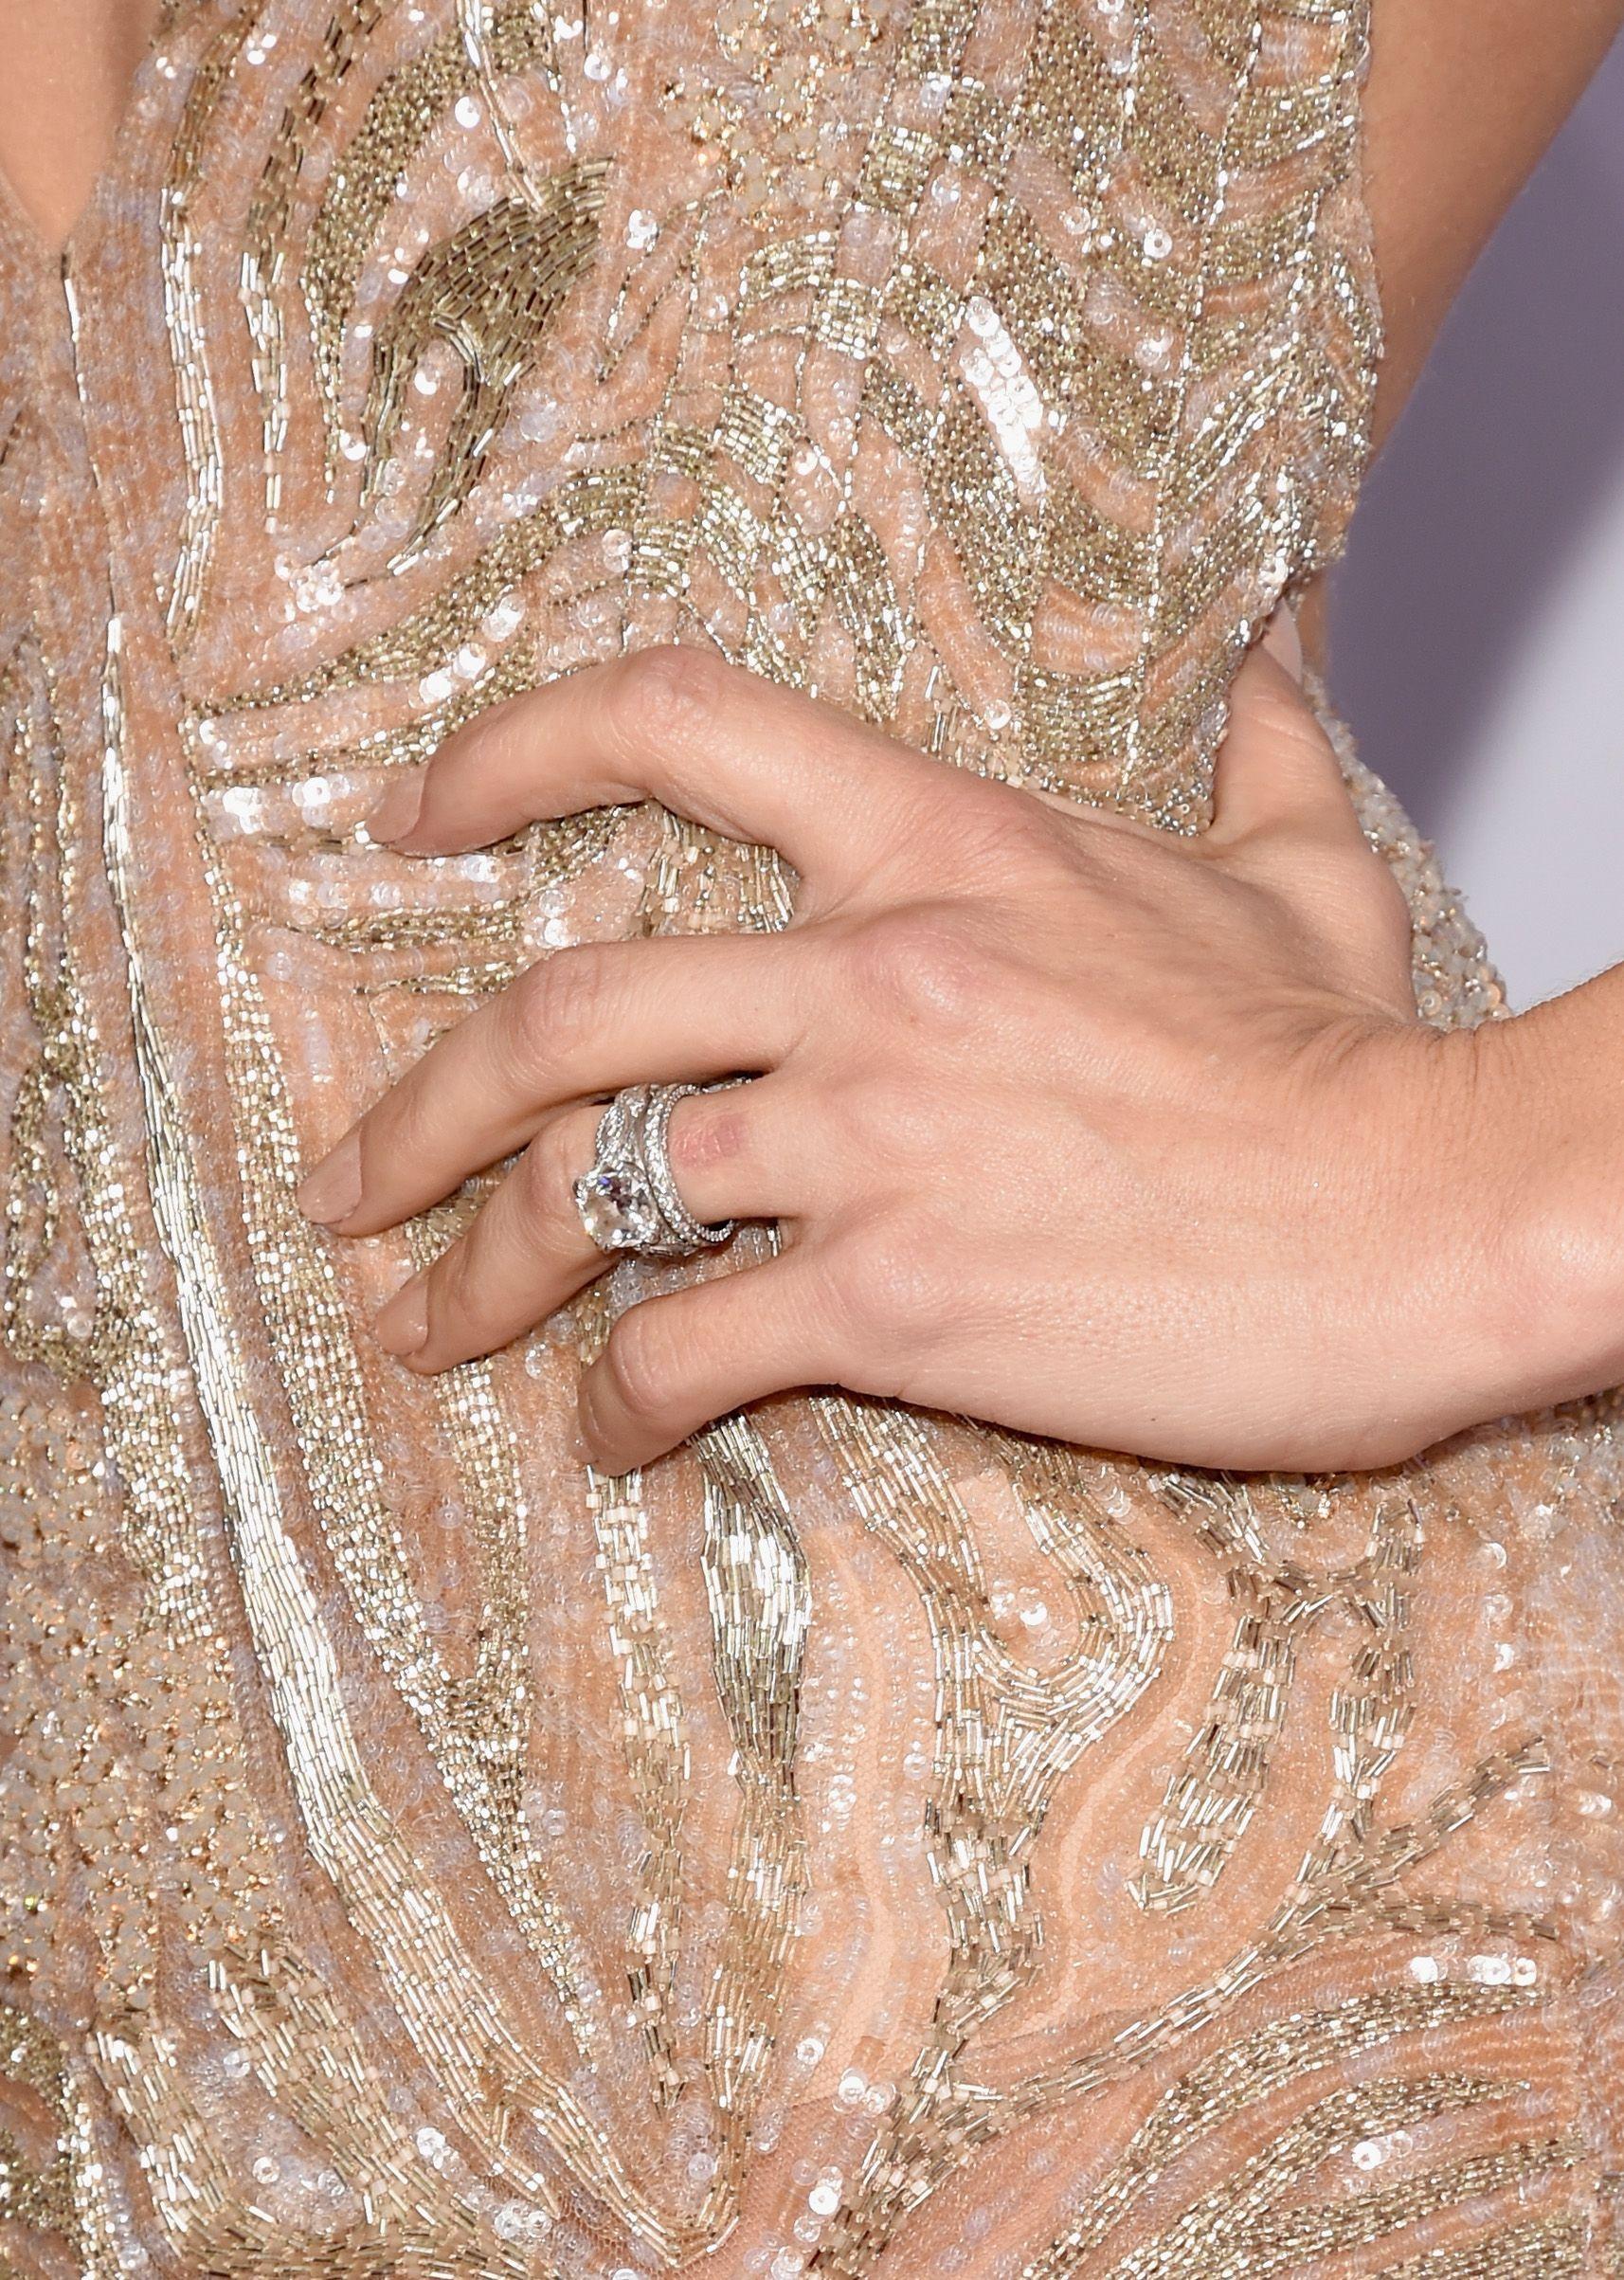 Jenna Dewan Marriage to Channing Tatum Is Over Jenna Dewan Not